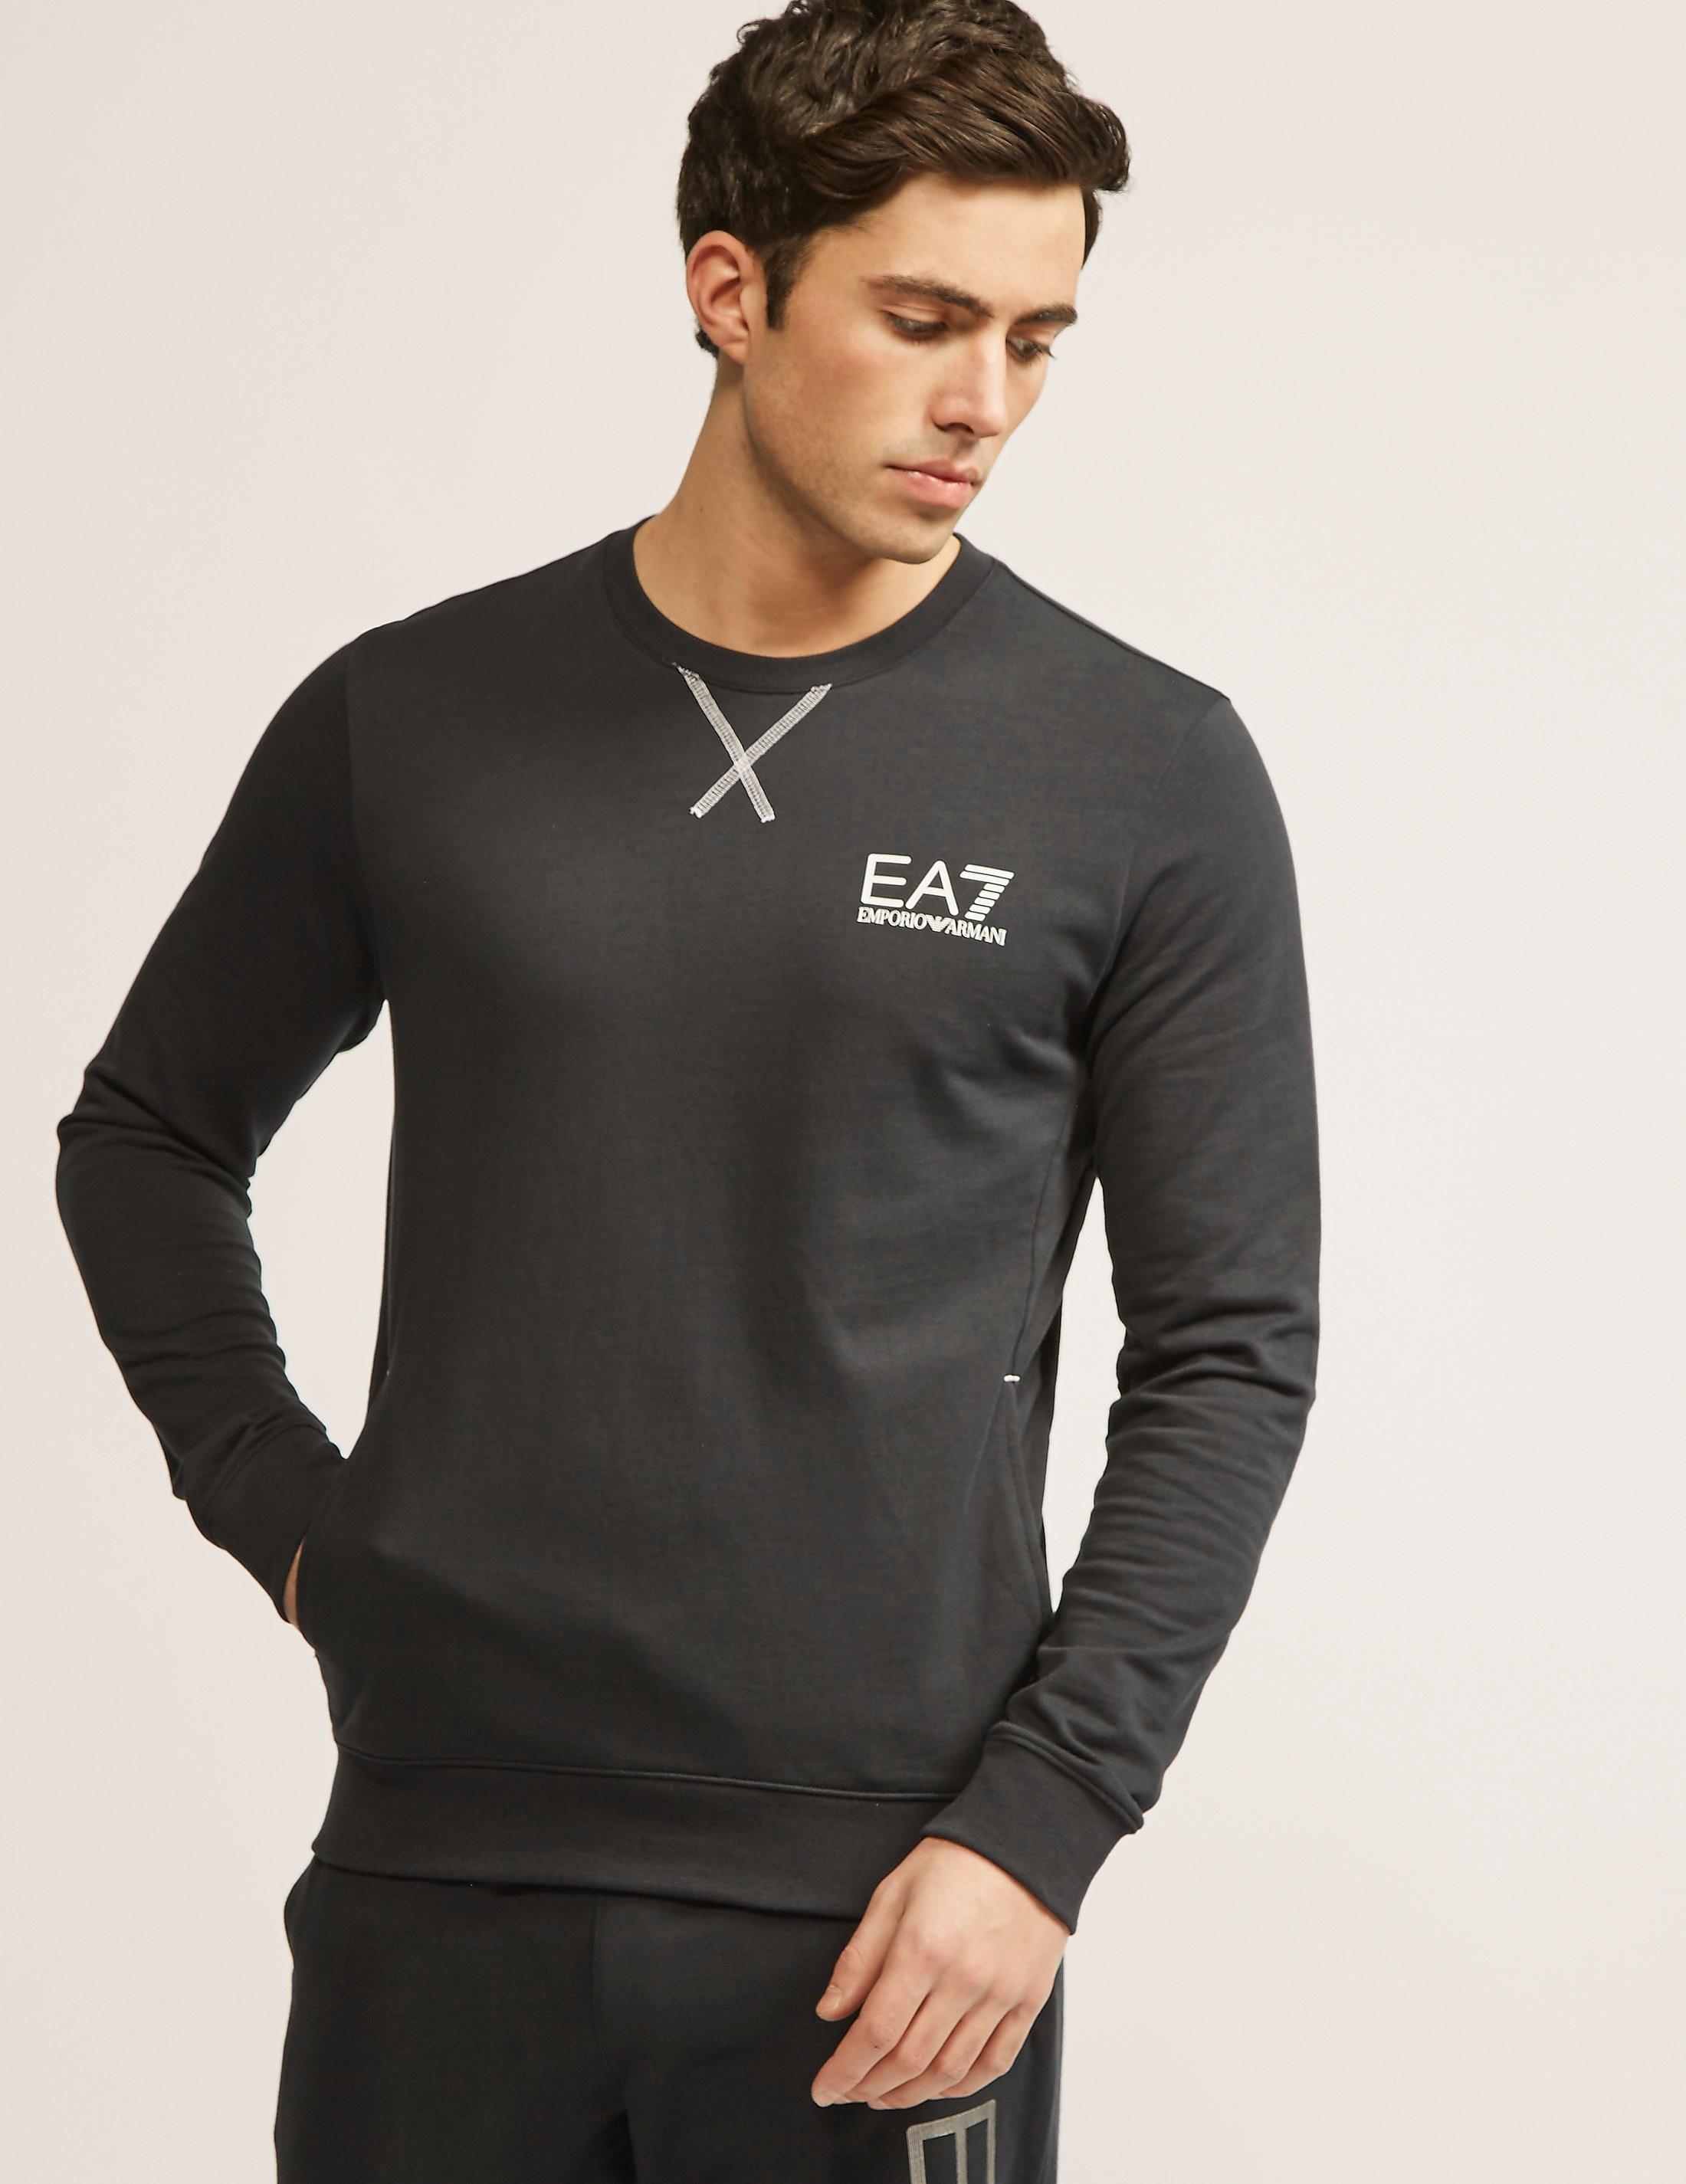 Emporio Armani EA7 Core ID Sweatshirt